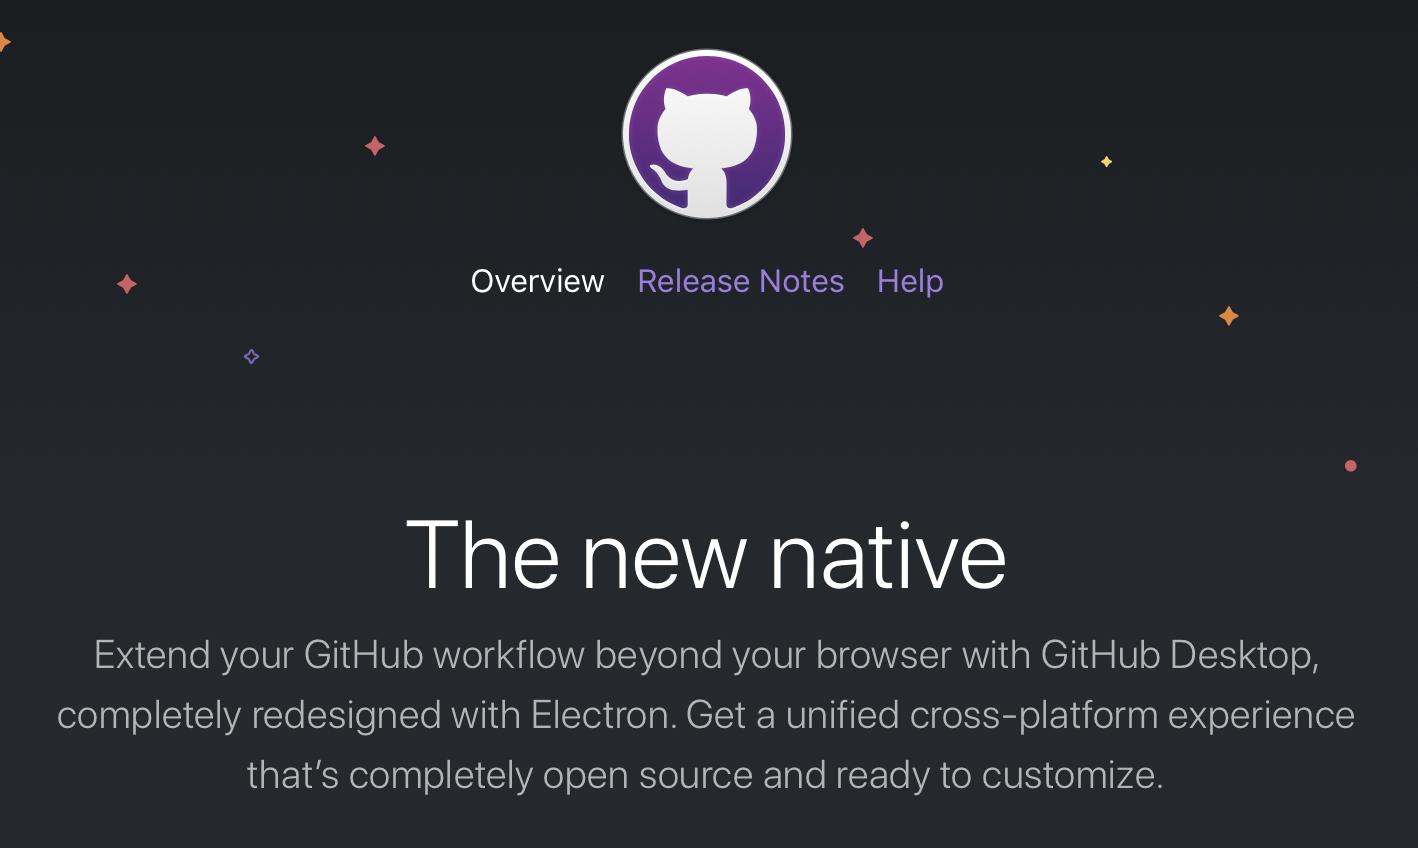 Website presents new version of GitHub Desktop